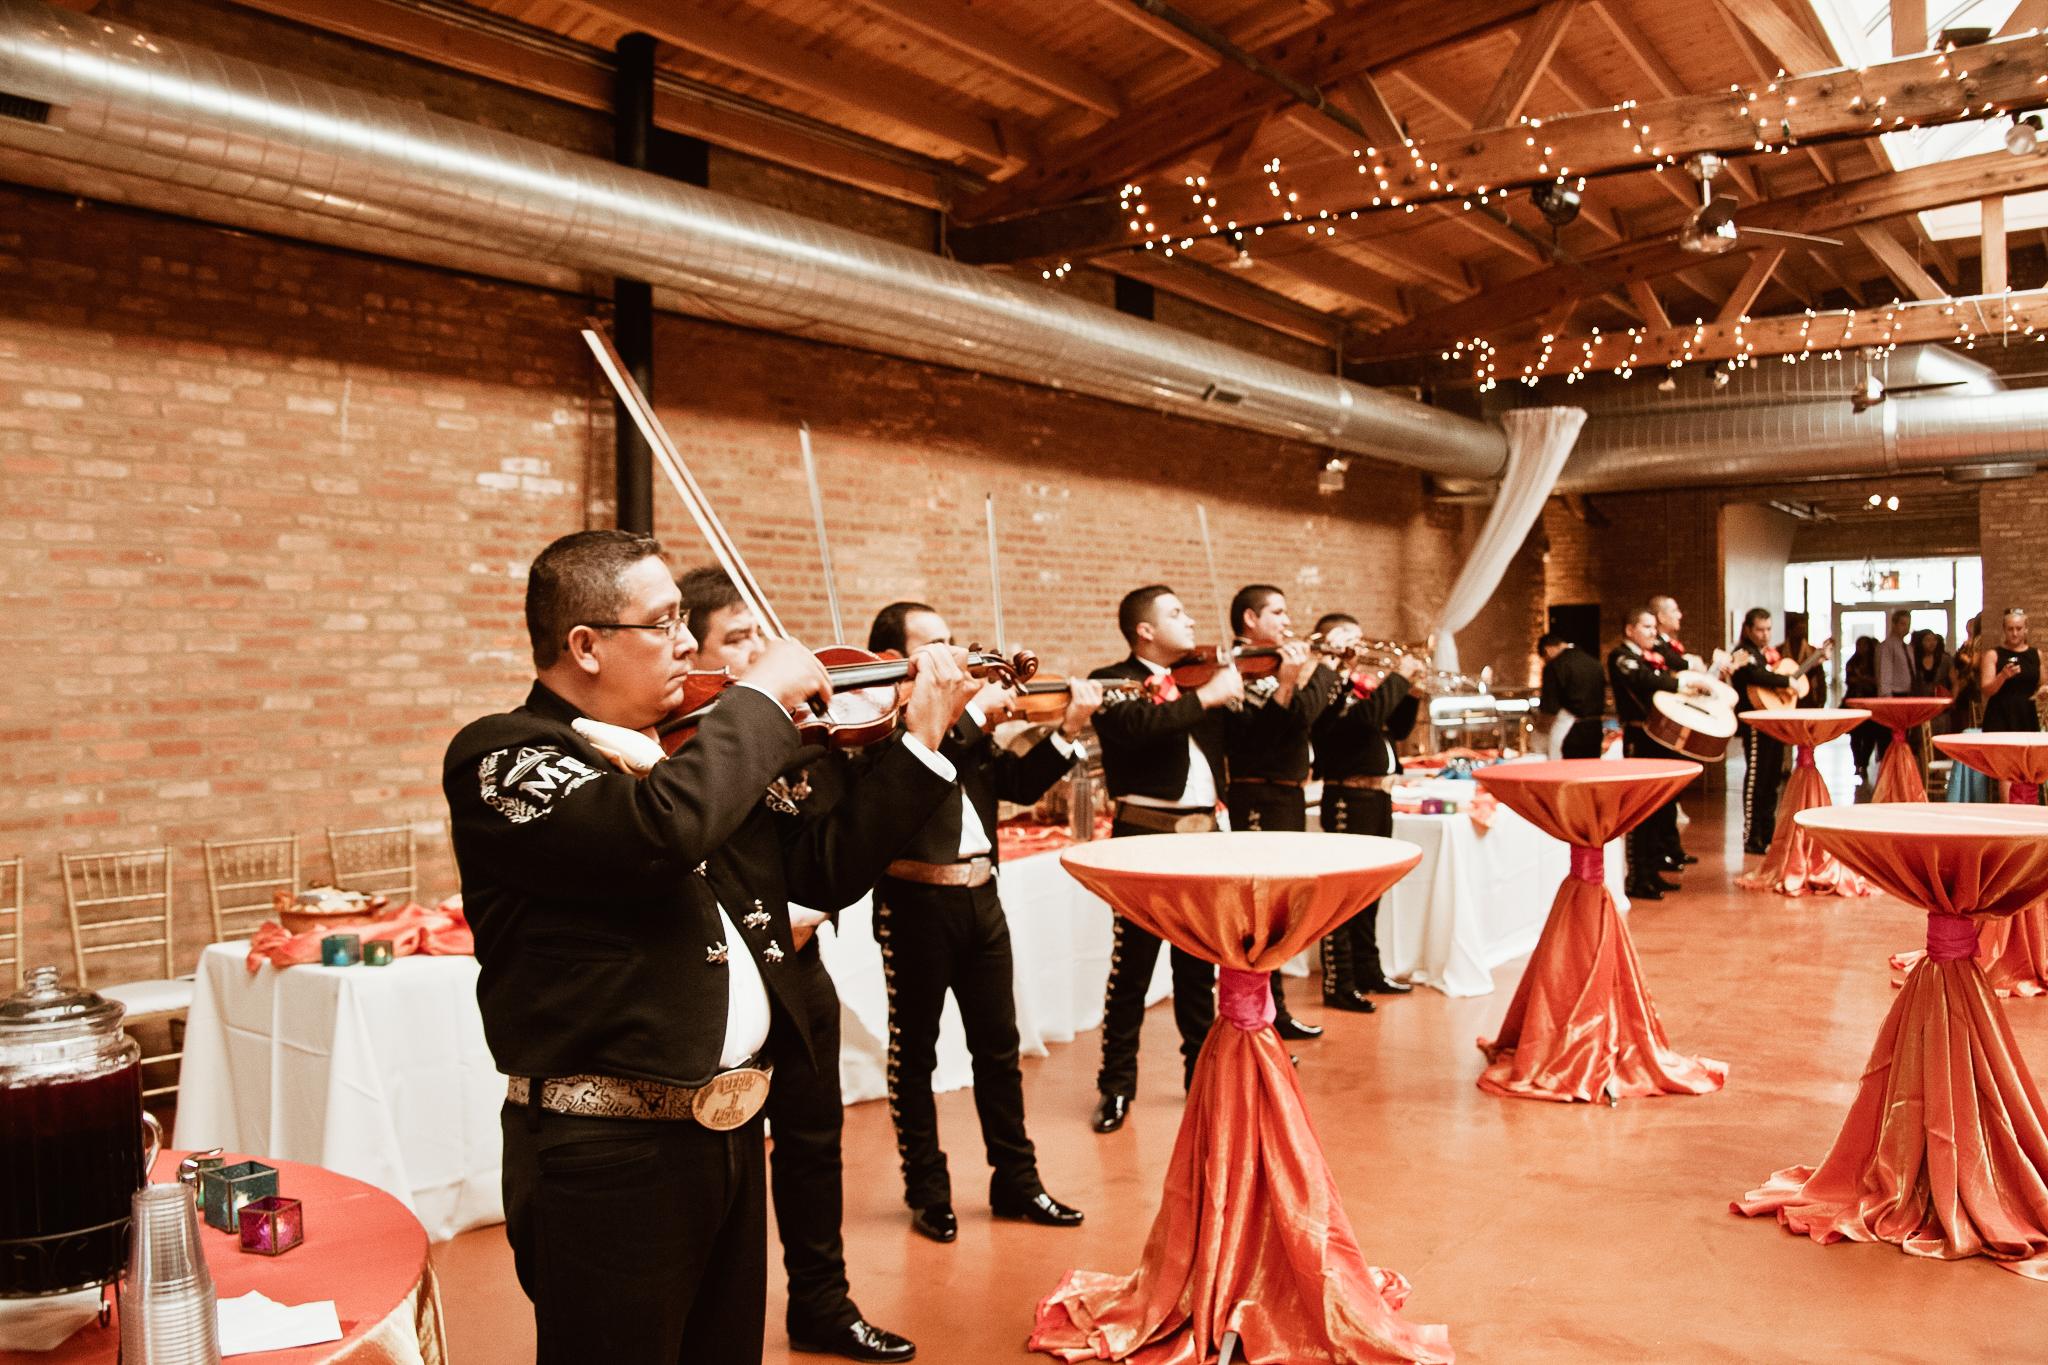 Music talent list - DUSTIN HARRISGREENLINE TALENTDJ ChicagoDJ HarshSTAND & CLAPTOAST & JAMTREBLE MONSTERS- LIVE MUSIC -STITLEY ENTERTAINMENTSWAY CHICAGO- harpist-meg rodgers